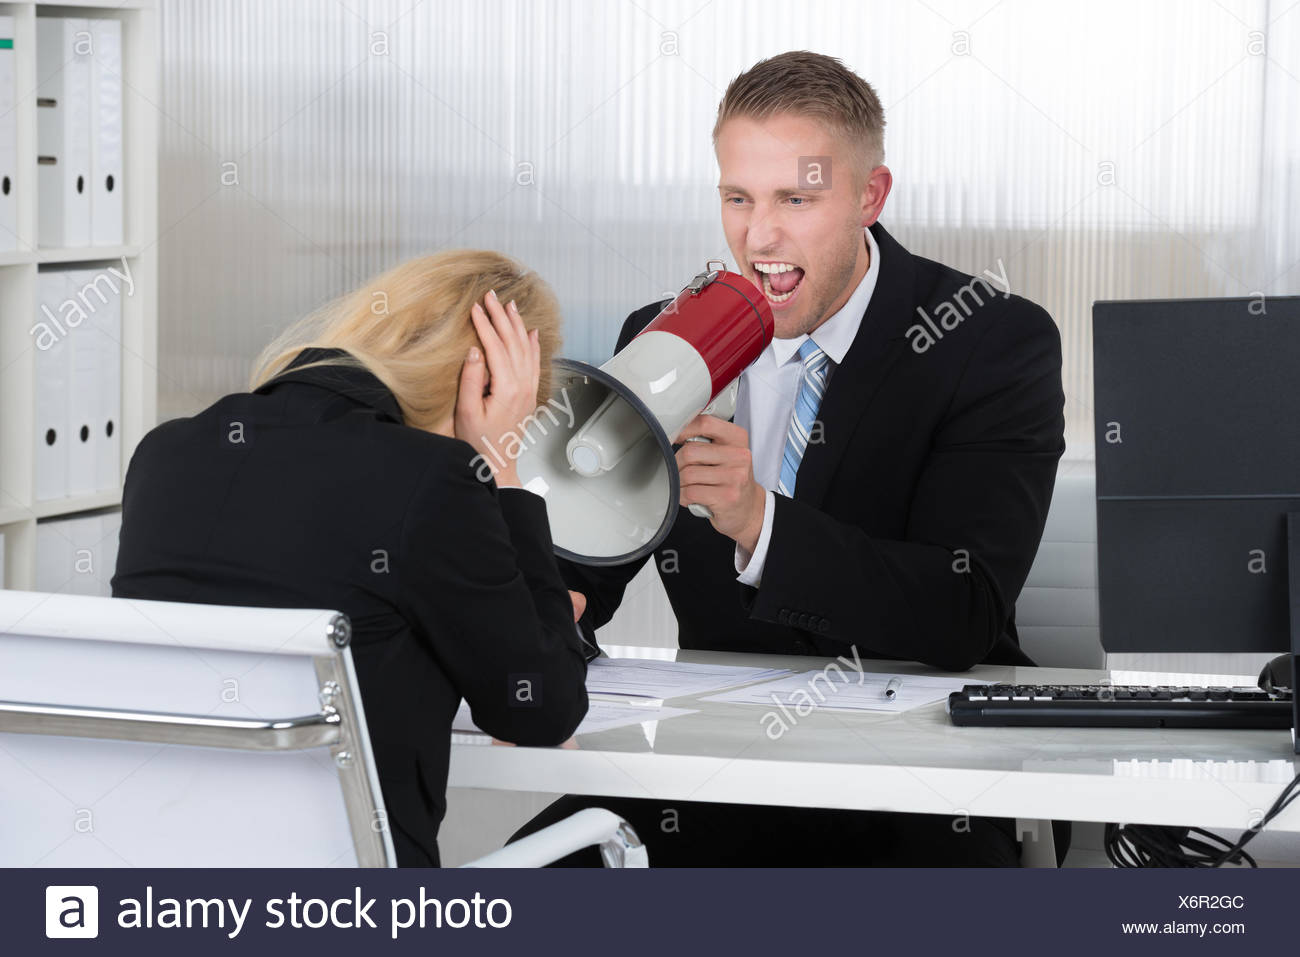 Boss Shouting At Businesswoman Through Loudspeaker In Office Stock Photo